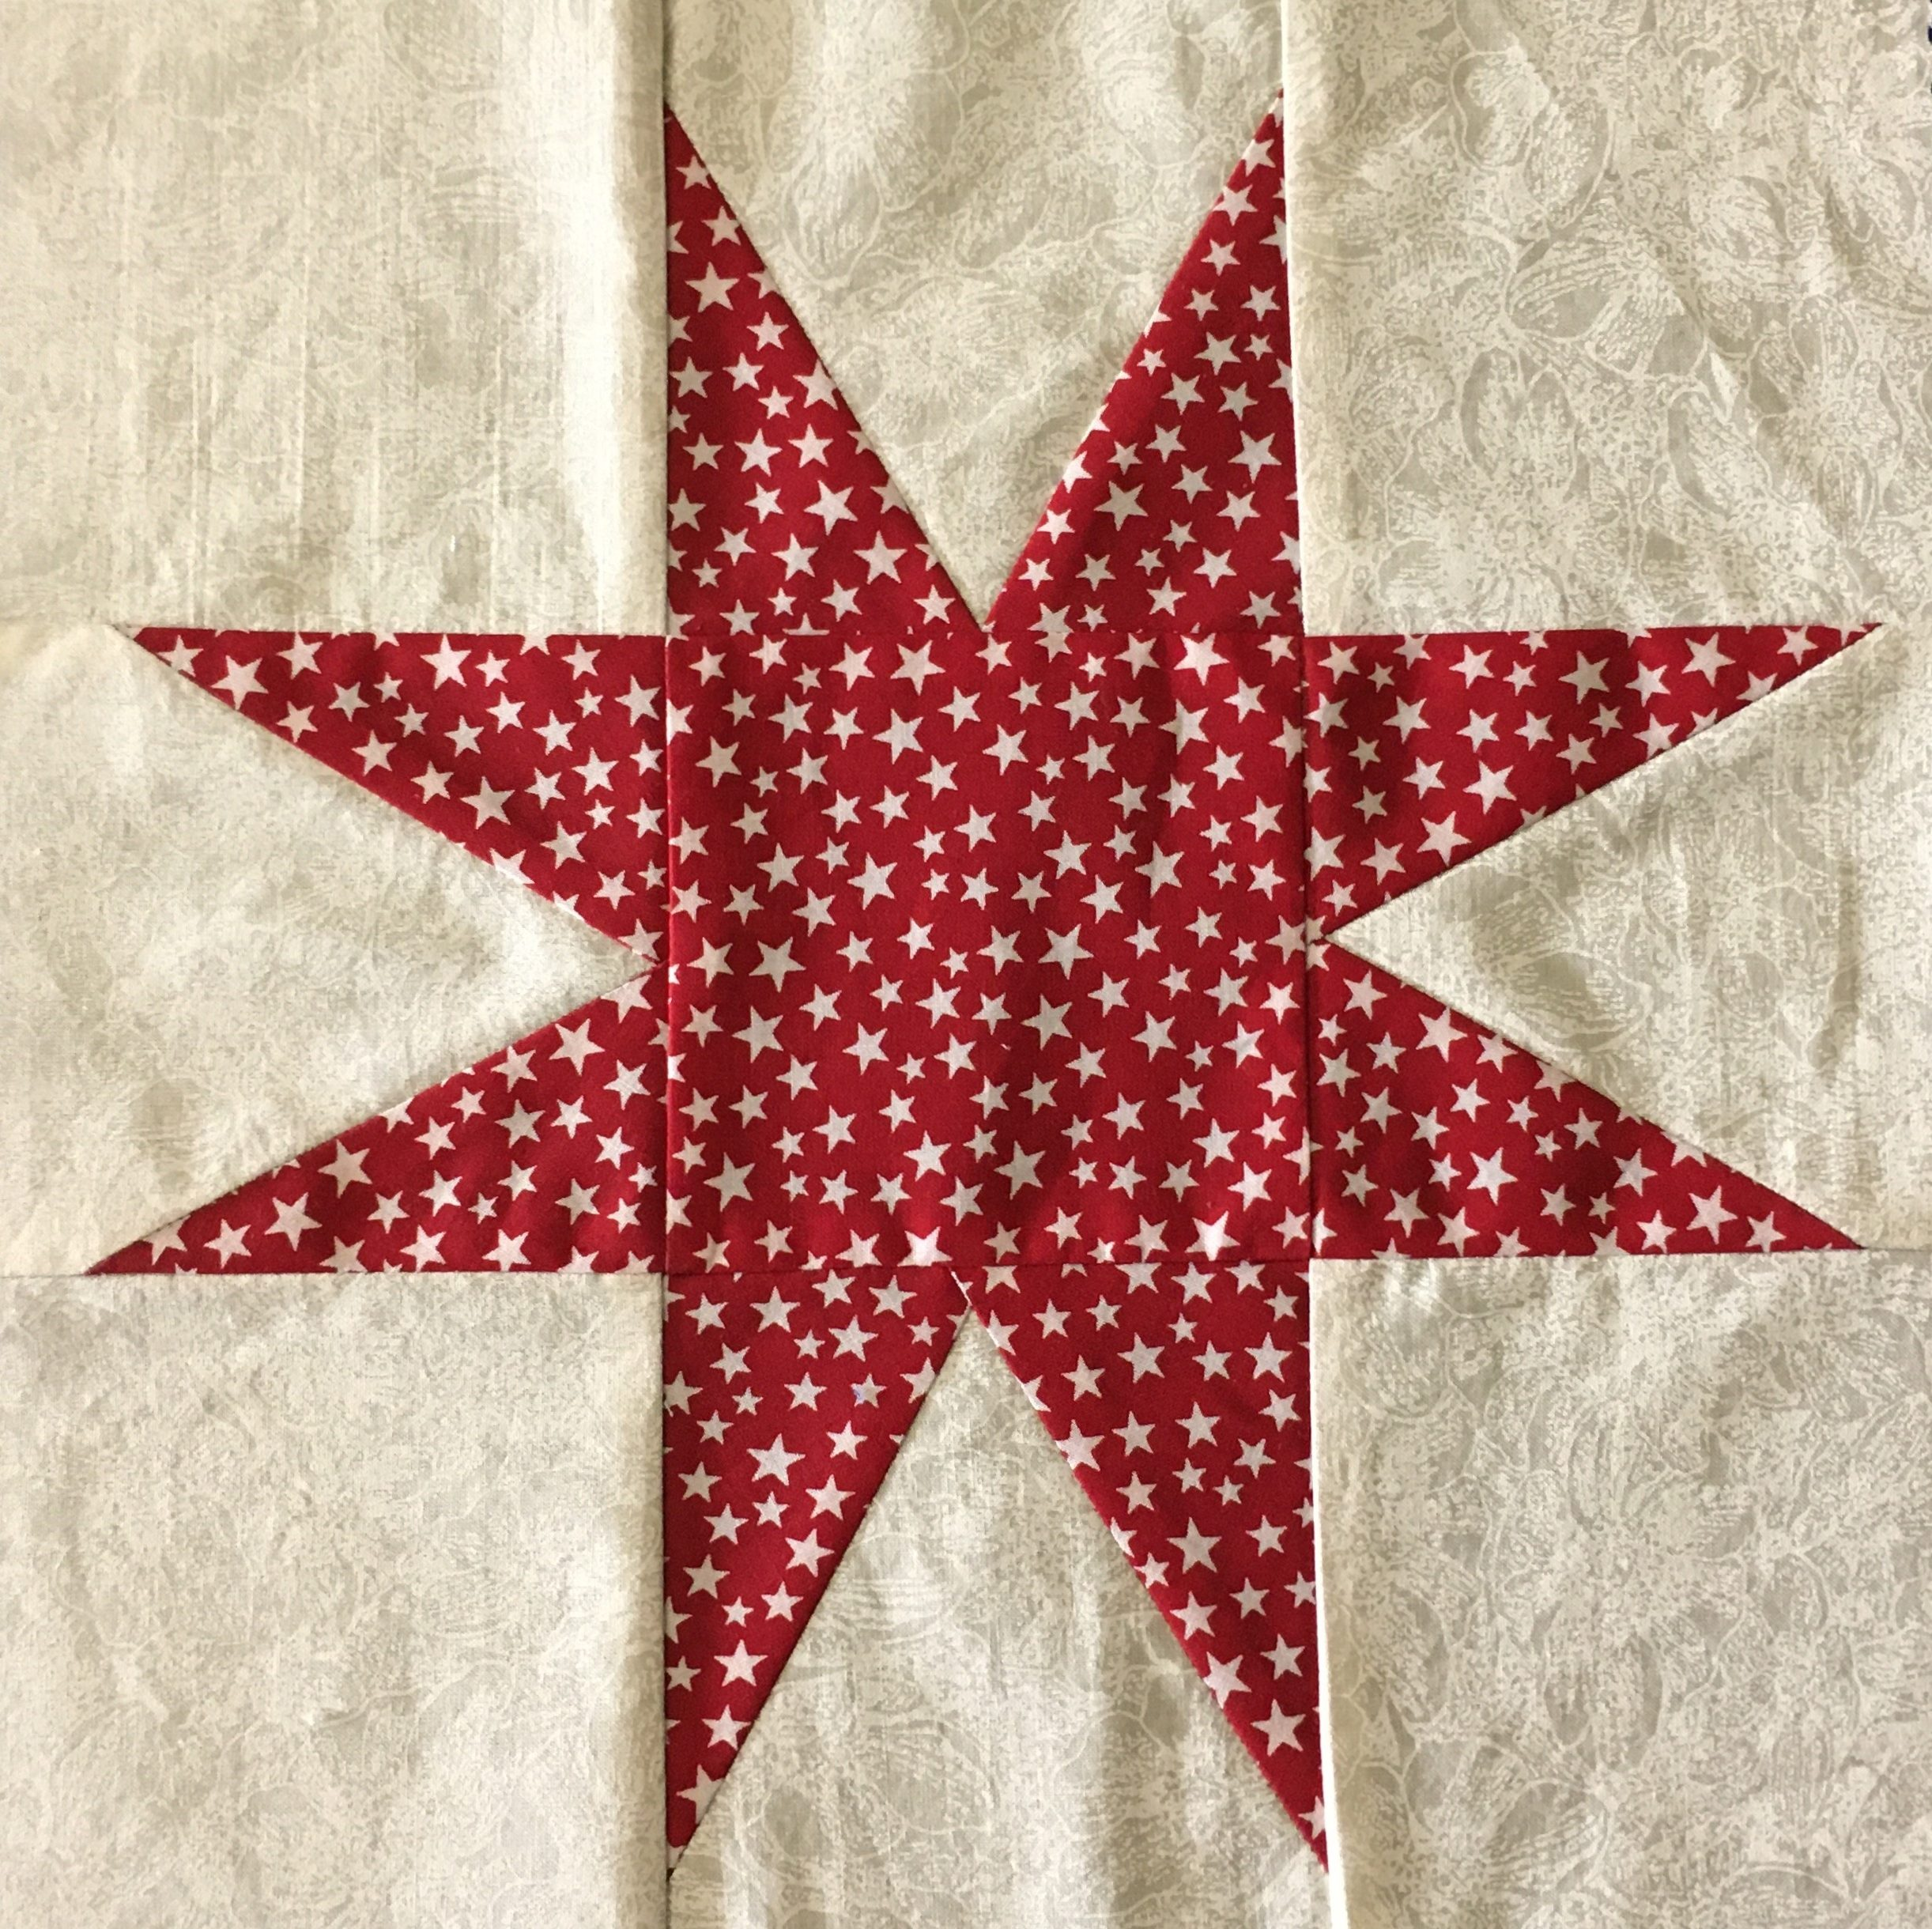 2021 - Eight Point Star